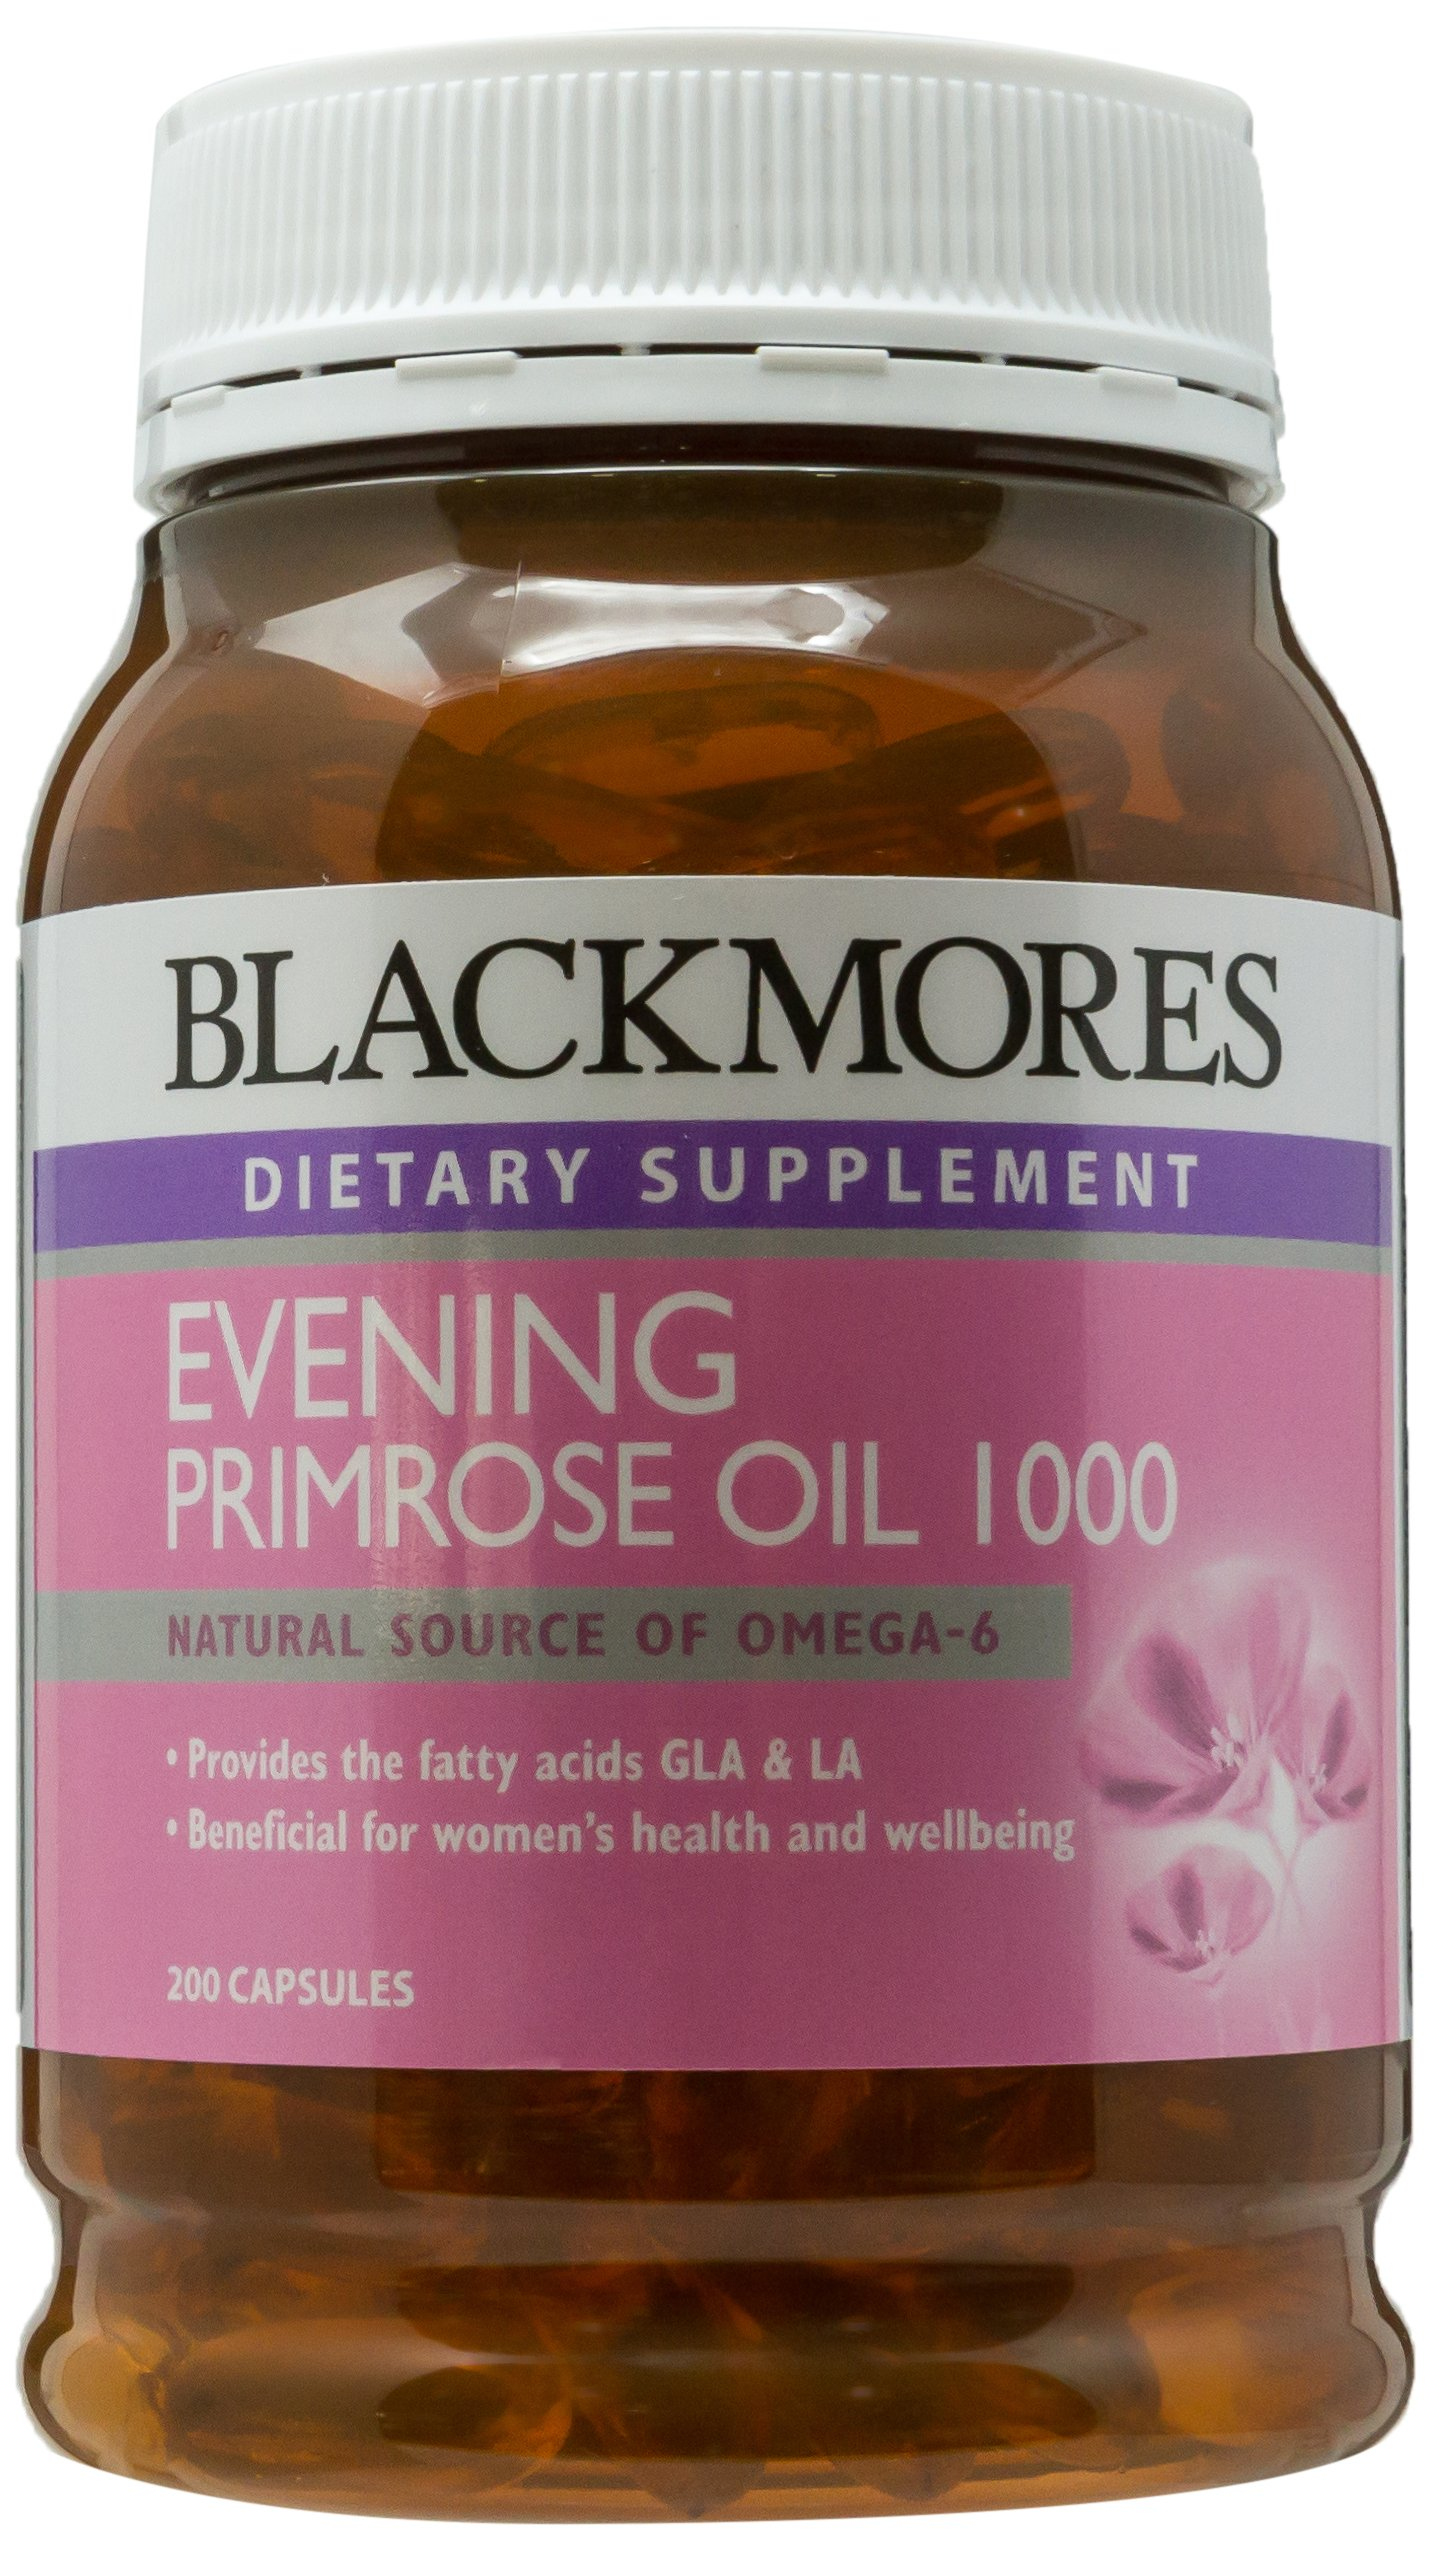 Blackmores Evening Primrose Oil 1000mg 200caps